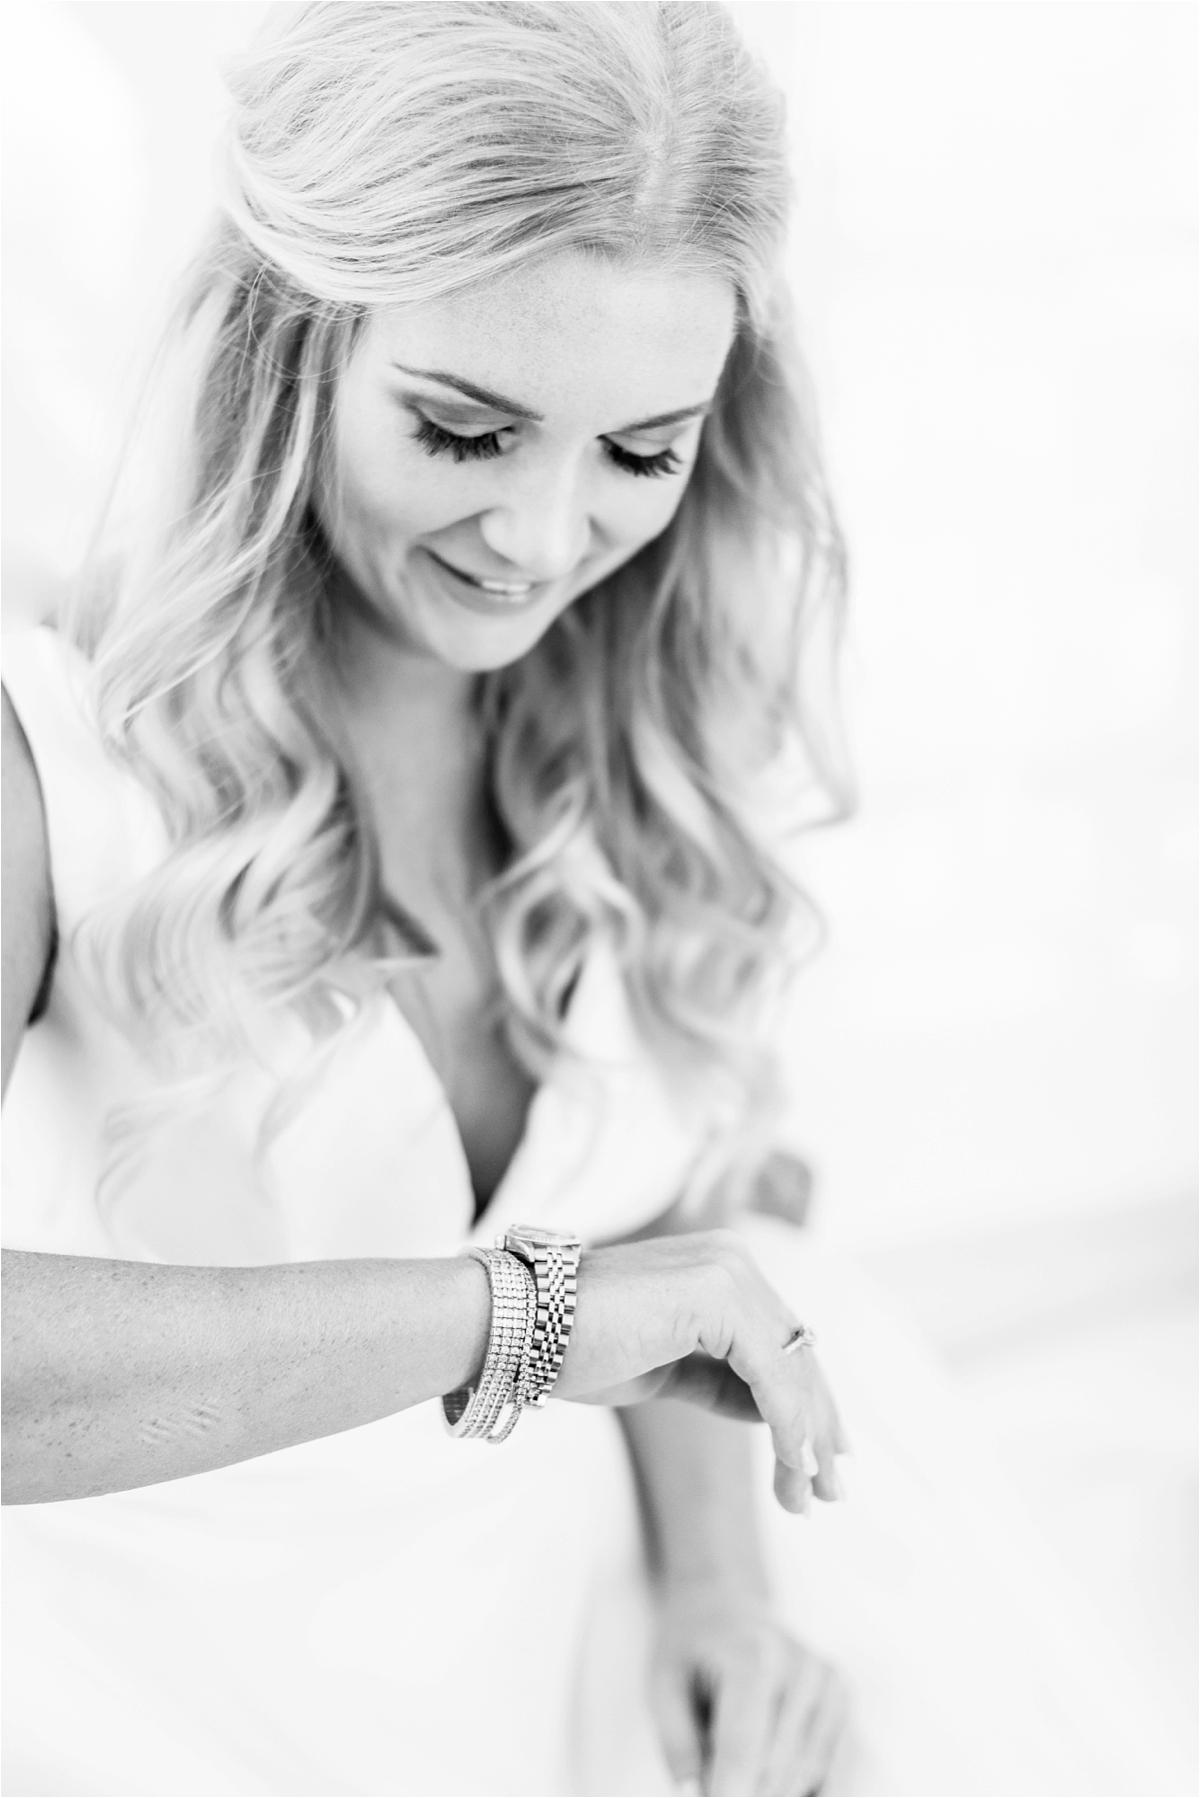 Seaside Florida Wedding Photographer-Catherine Carter + Brian-Bridal shoot-Bride-Wedding dress-Alabama photographer